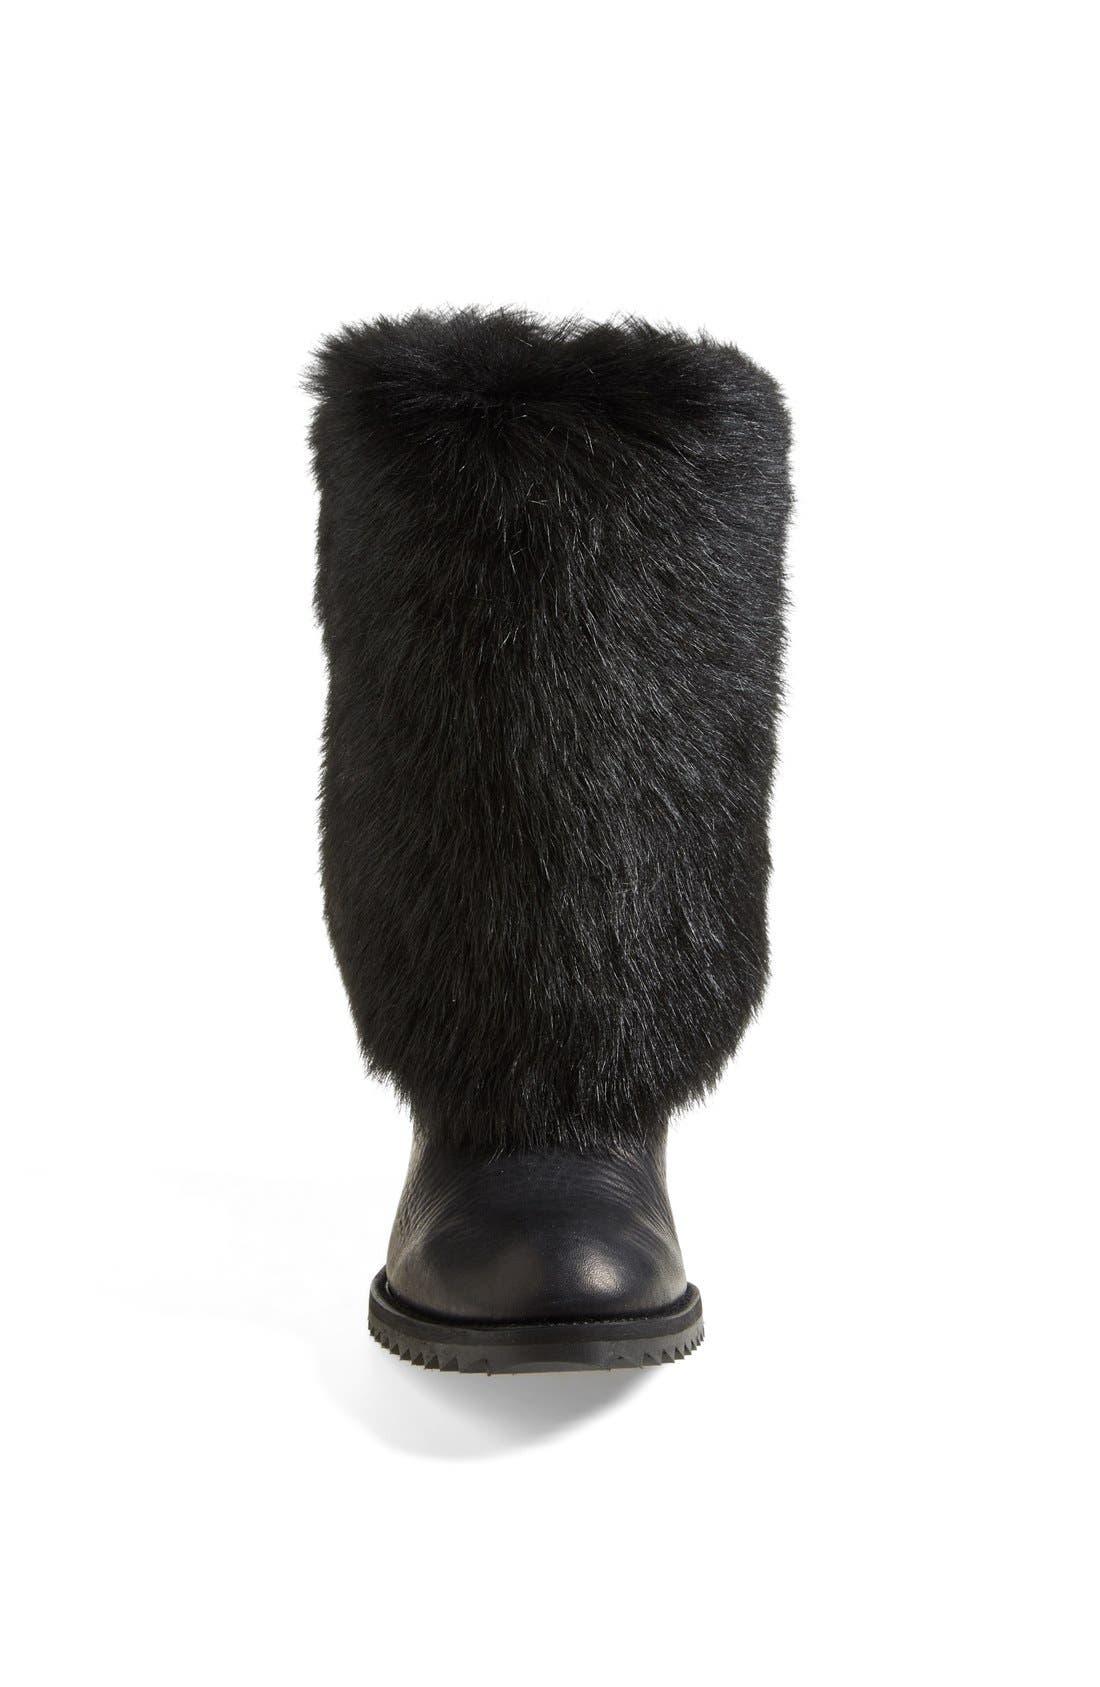 Alternate Image 3  - Pedro Garcia 'Odette' Genuine Shearling & Leather Boot (Women)